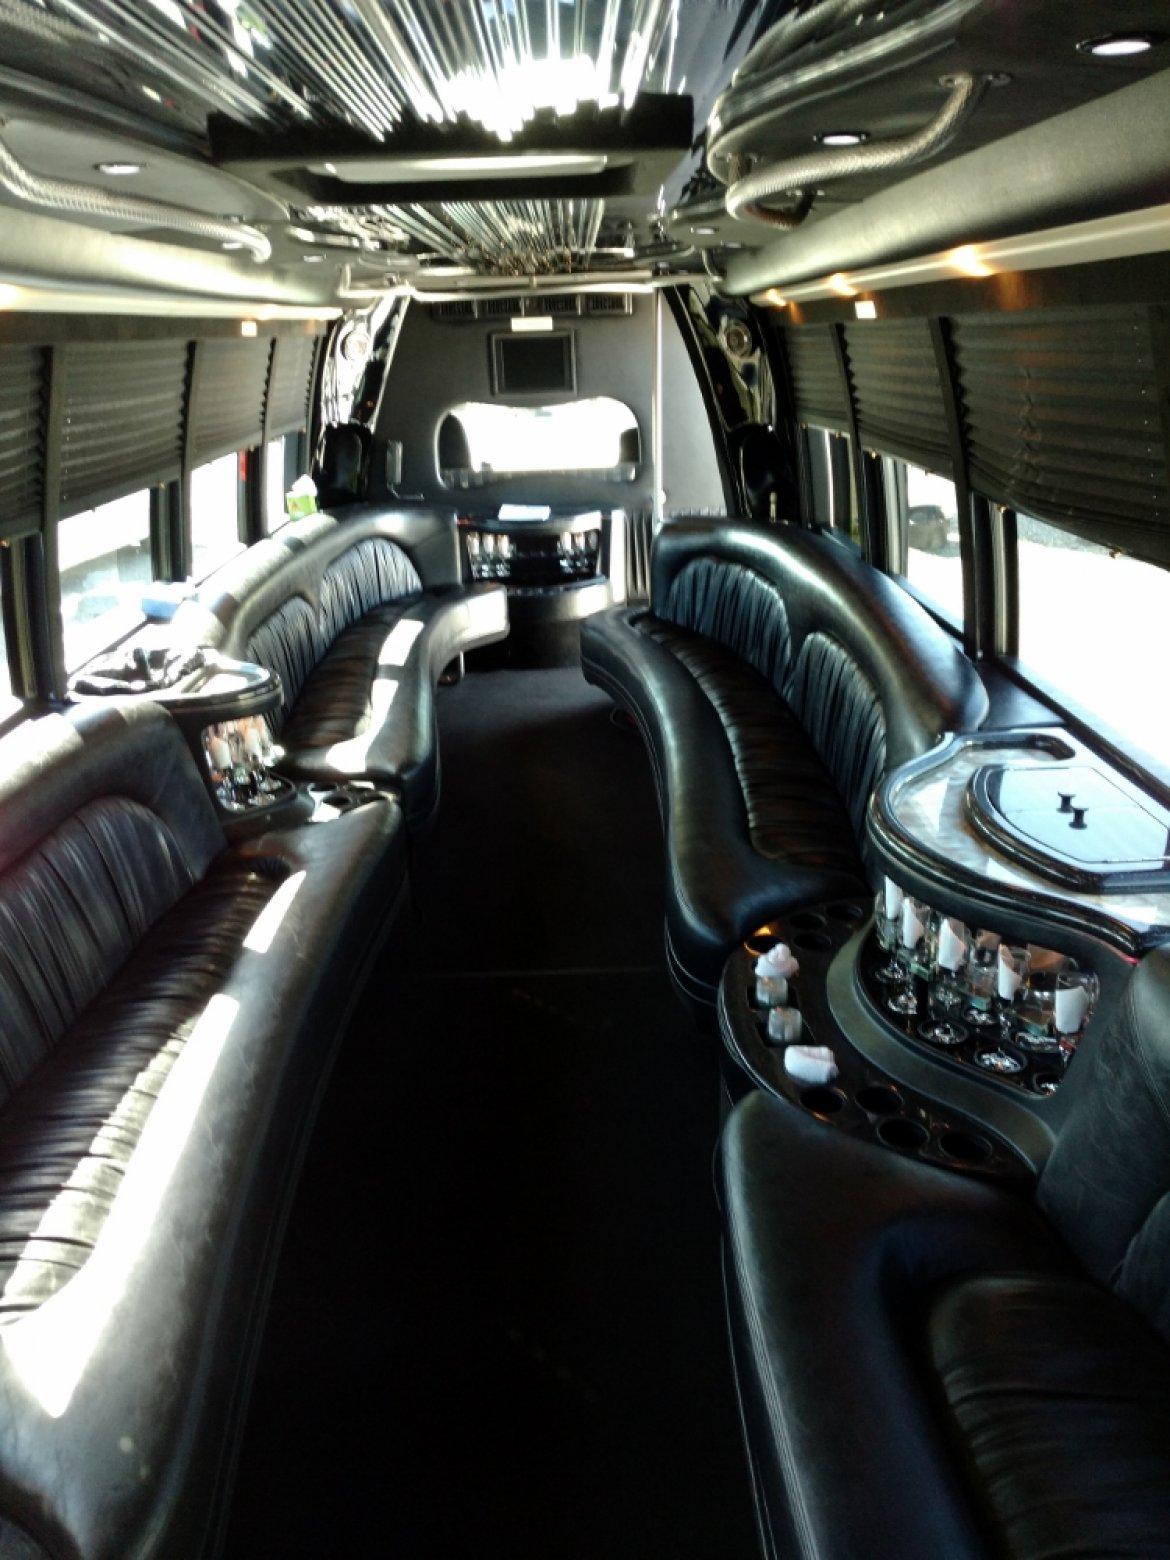 Photo of Limo Bus for sale: 2005 International KK38 by Krystal